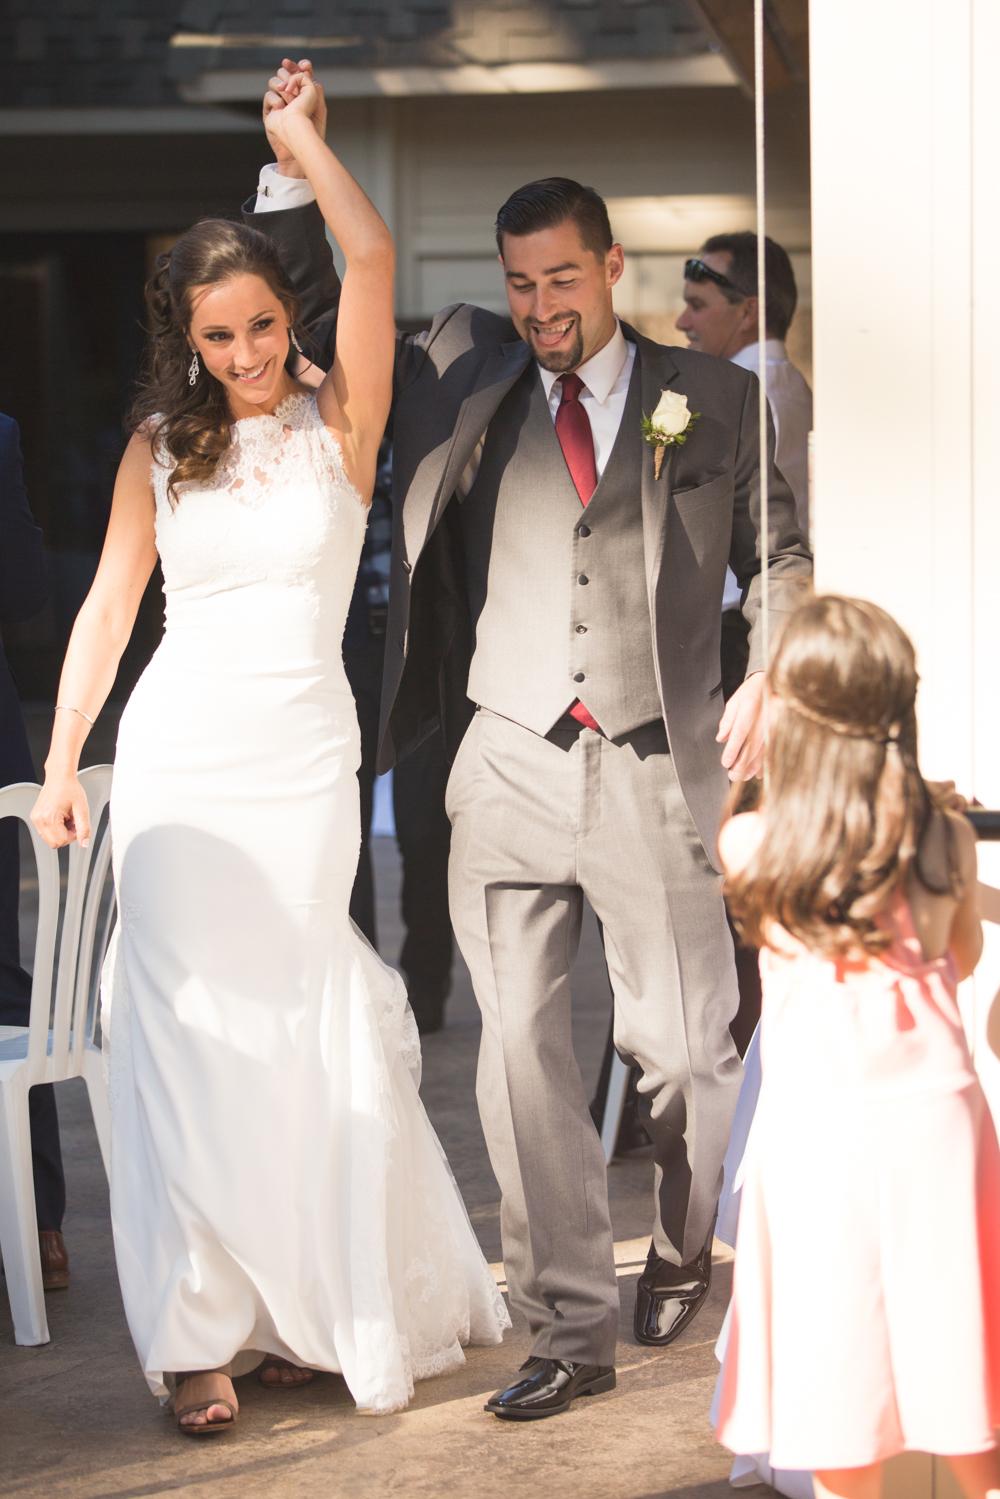 wedding-grand-entrance-sequoia-woods.jpg